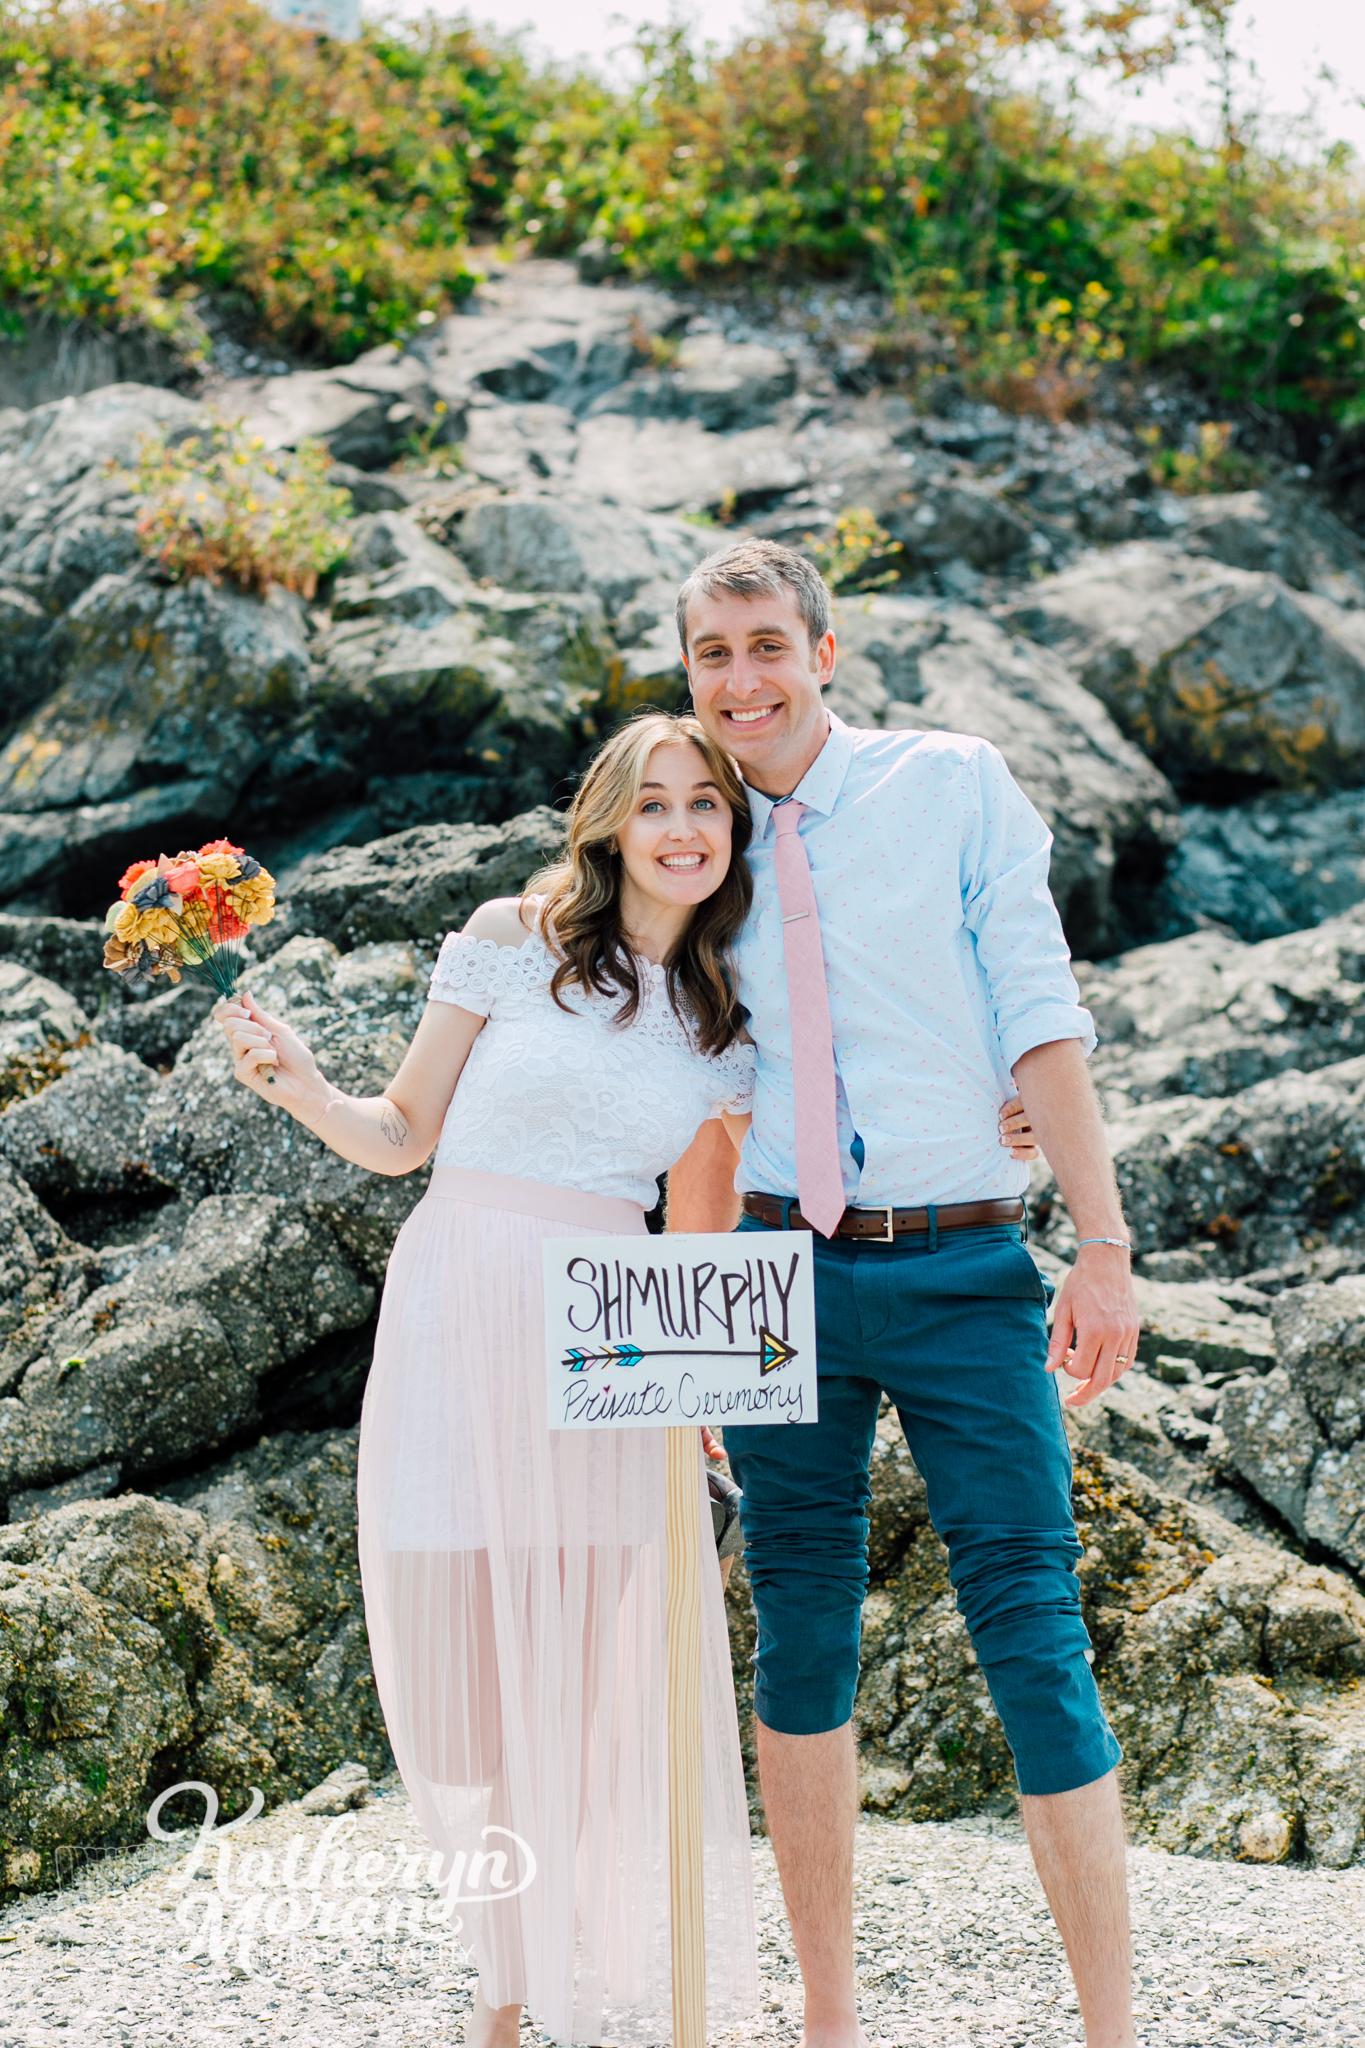 orcas-island-wedding-photographer-katheryn-moran-shayna-shaunn-14.jpg